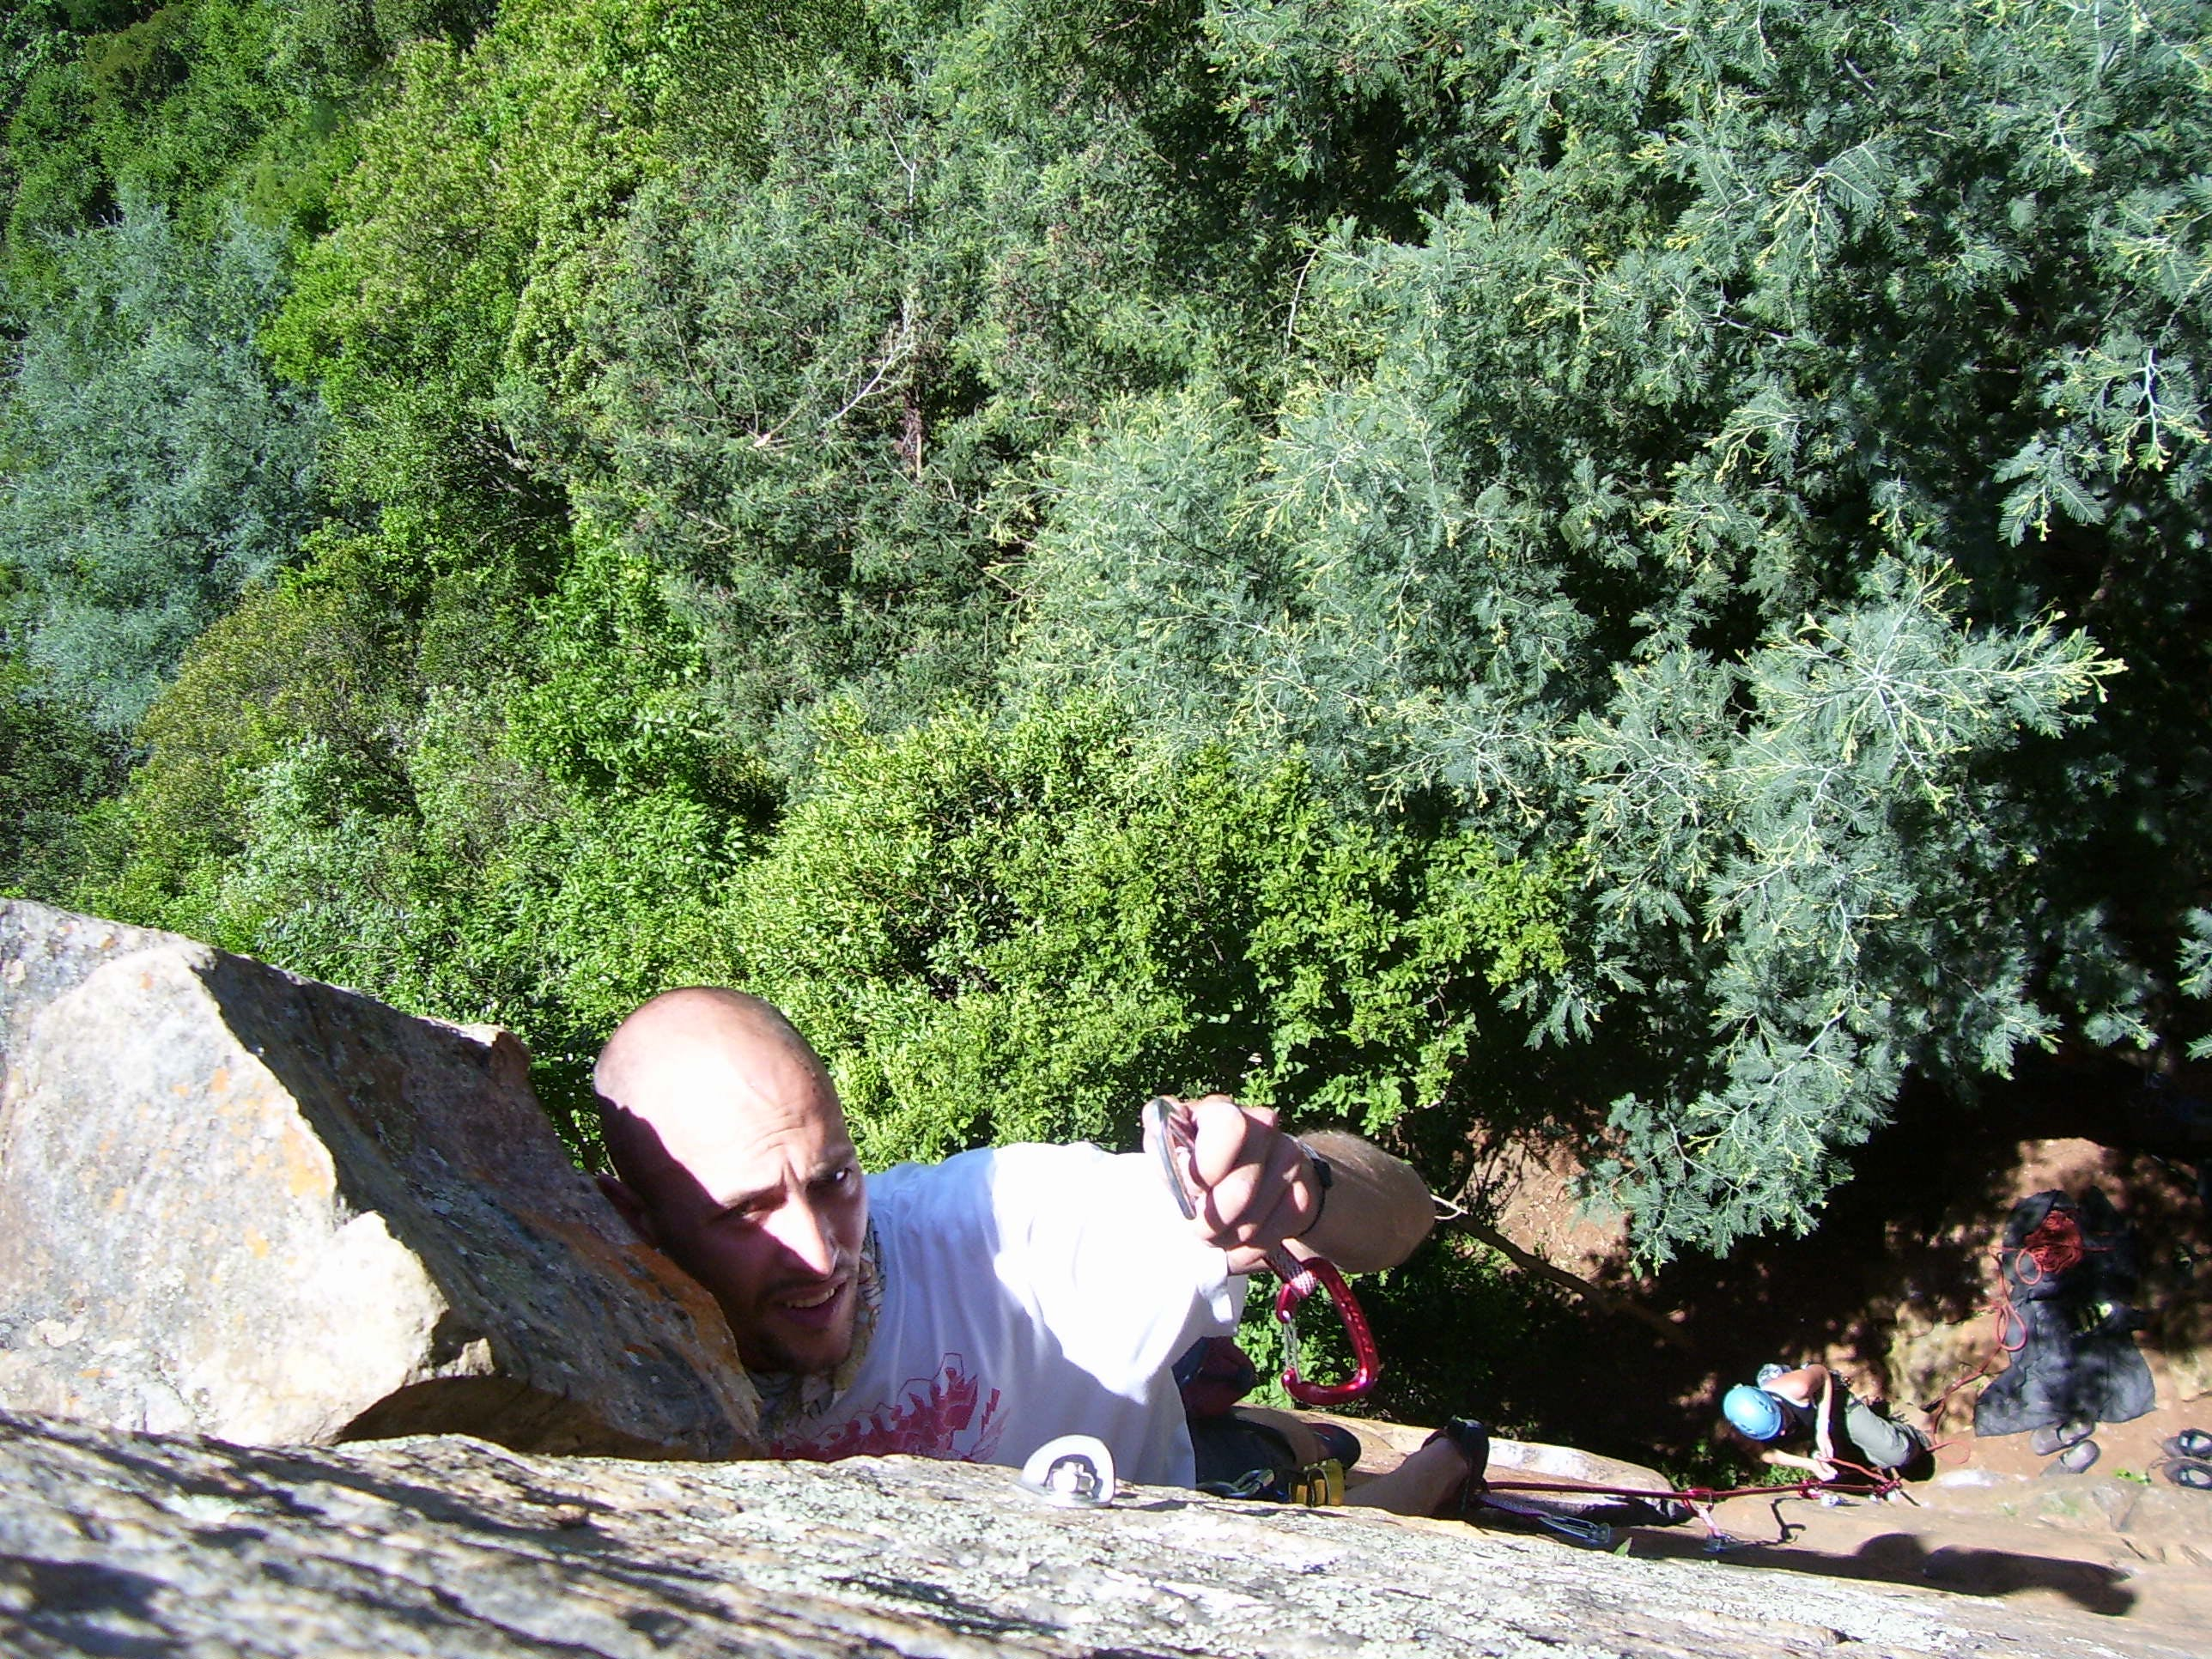 Free stock photo of rock climbing